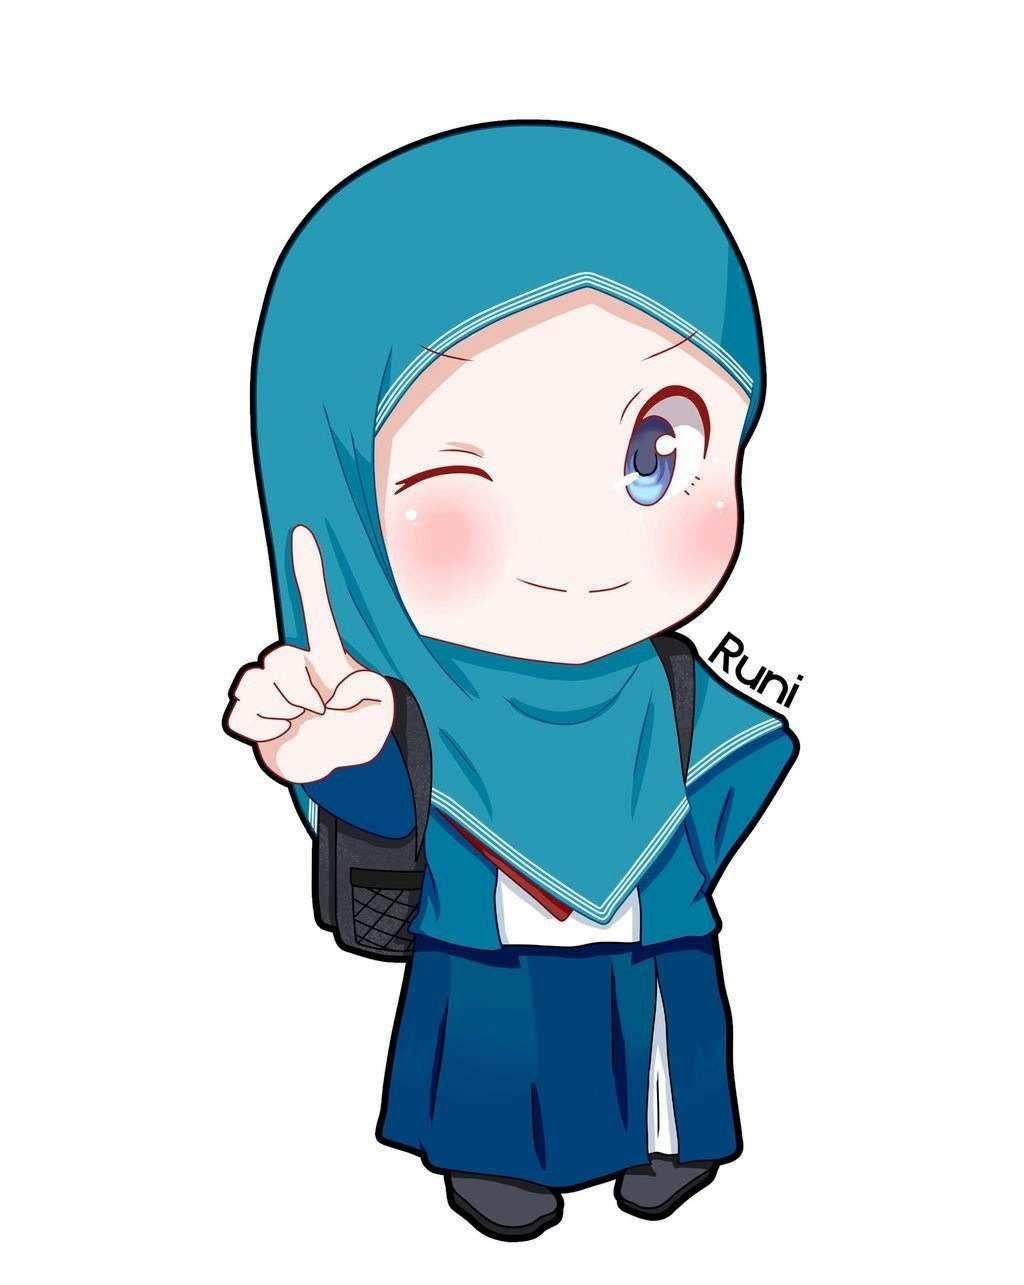 Gambar Wallpaper Kartun Perempuan Gambar Kartun Anak Perempuan Muslimah U2013 Blog Teraktual In 2020 Islamic Cartoon Anime Muslim Hijab Cartoon